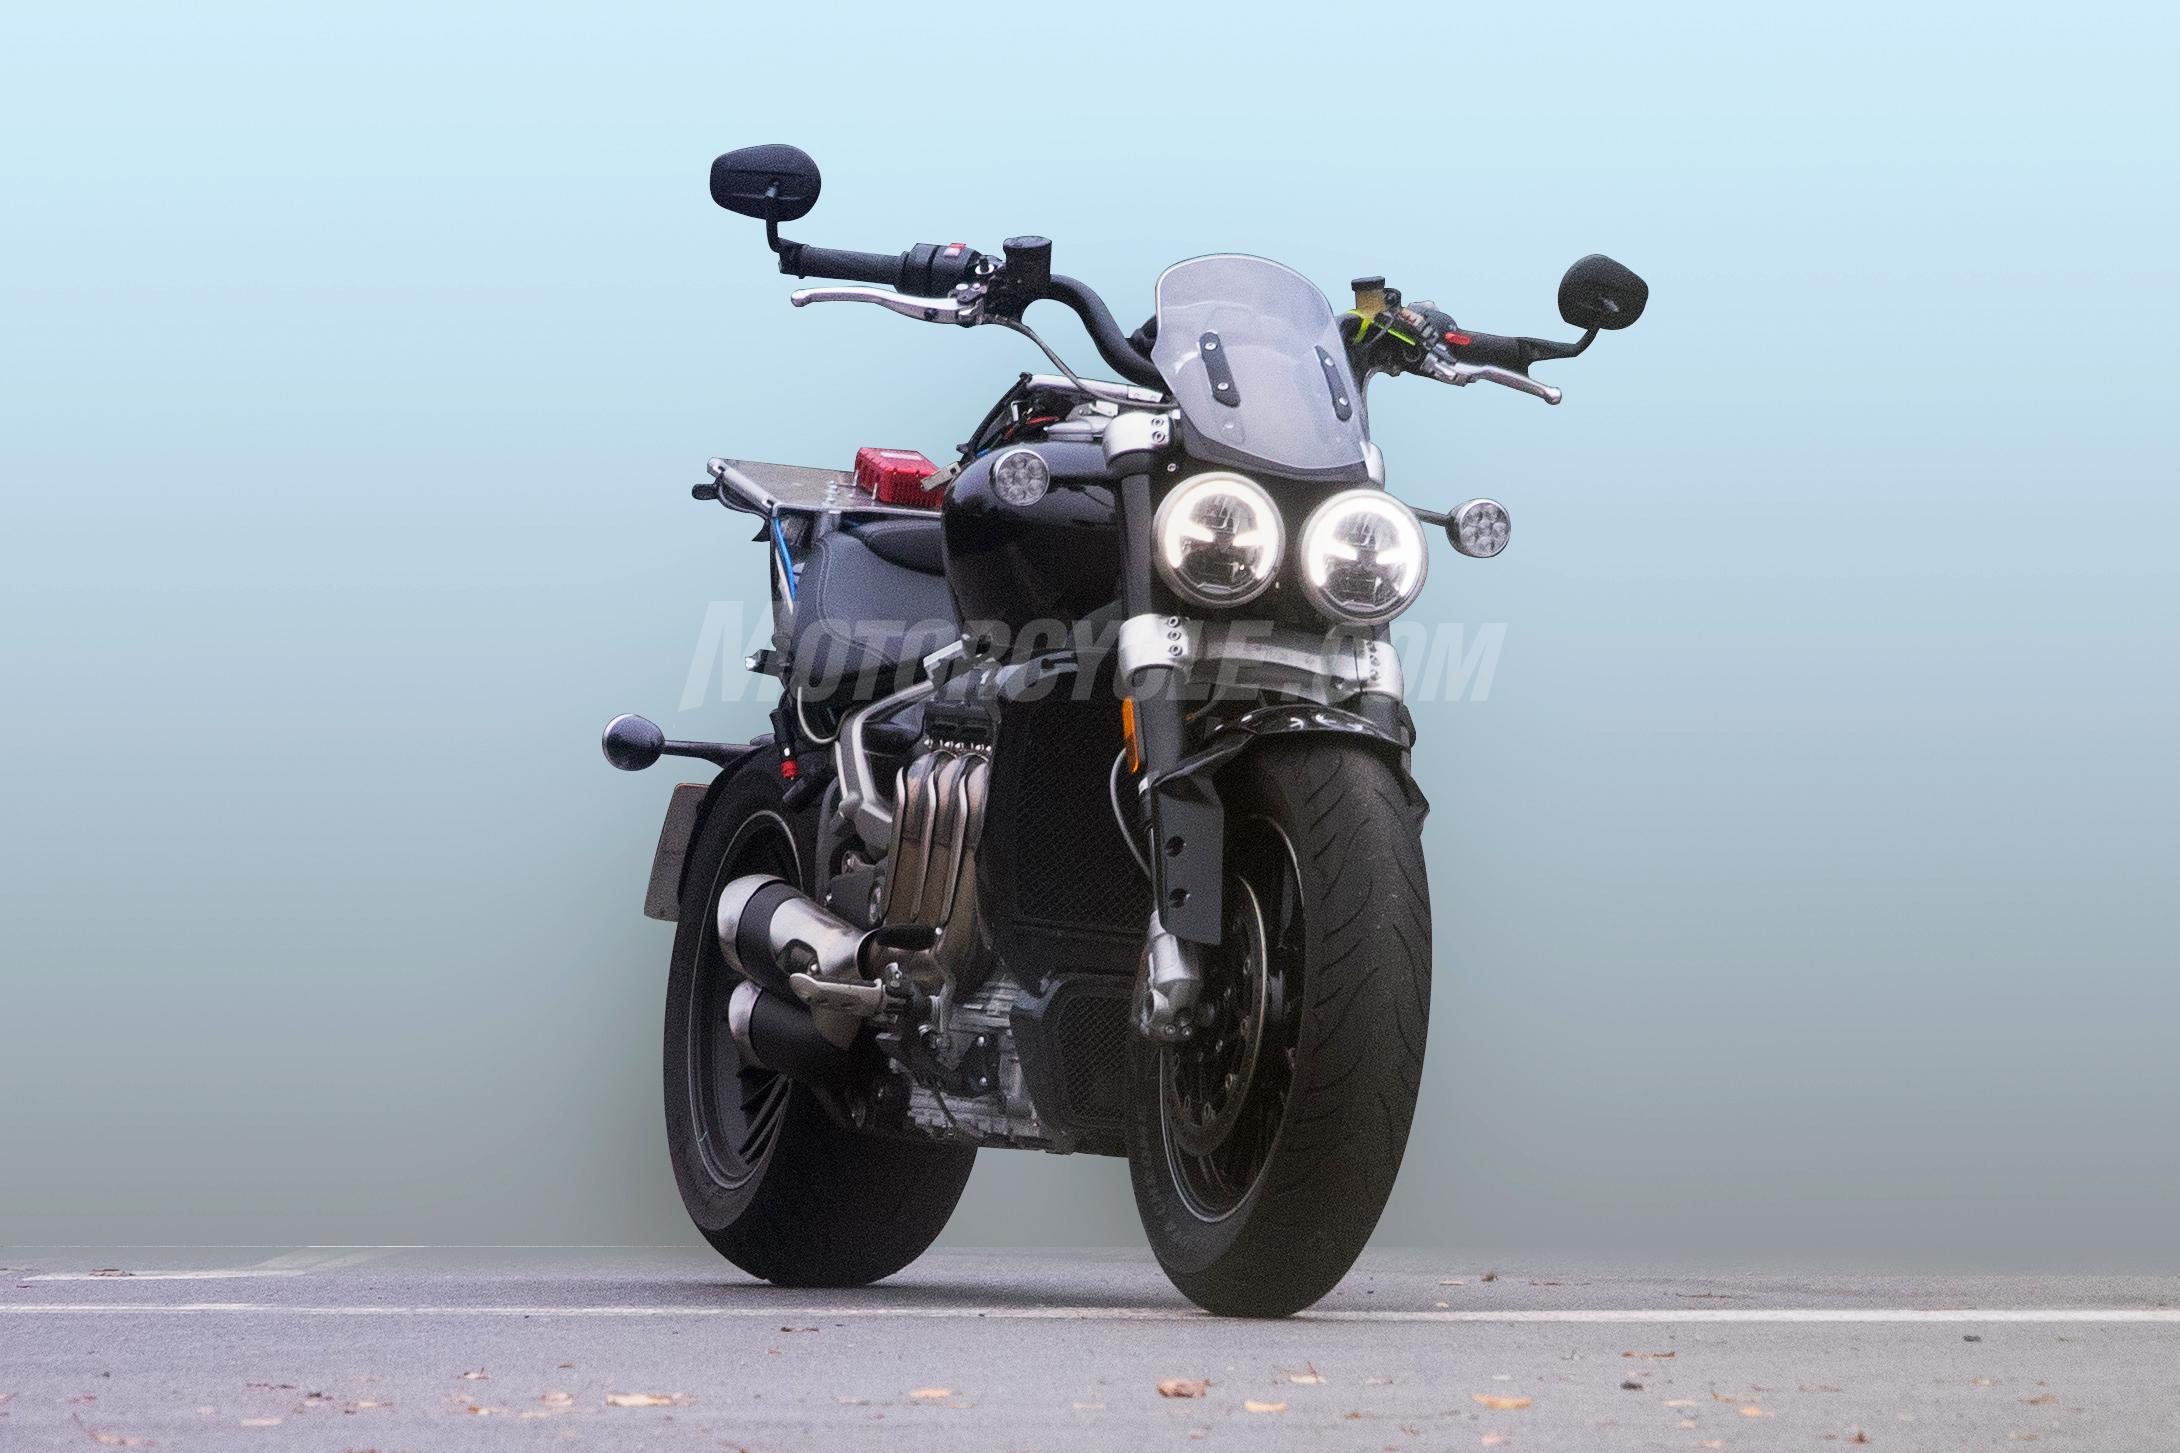 011019-2020-Triumph-Rocket-III-spy-photos-001